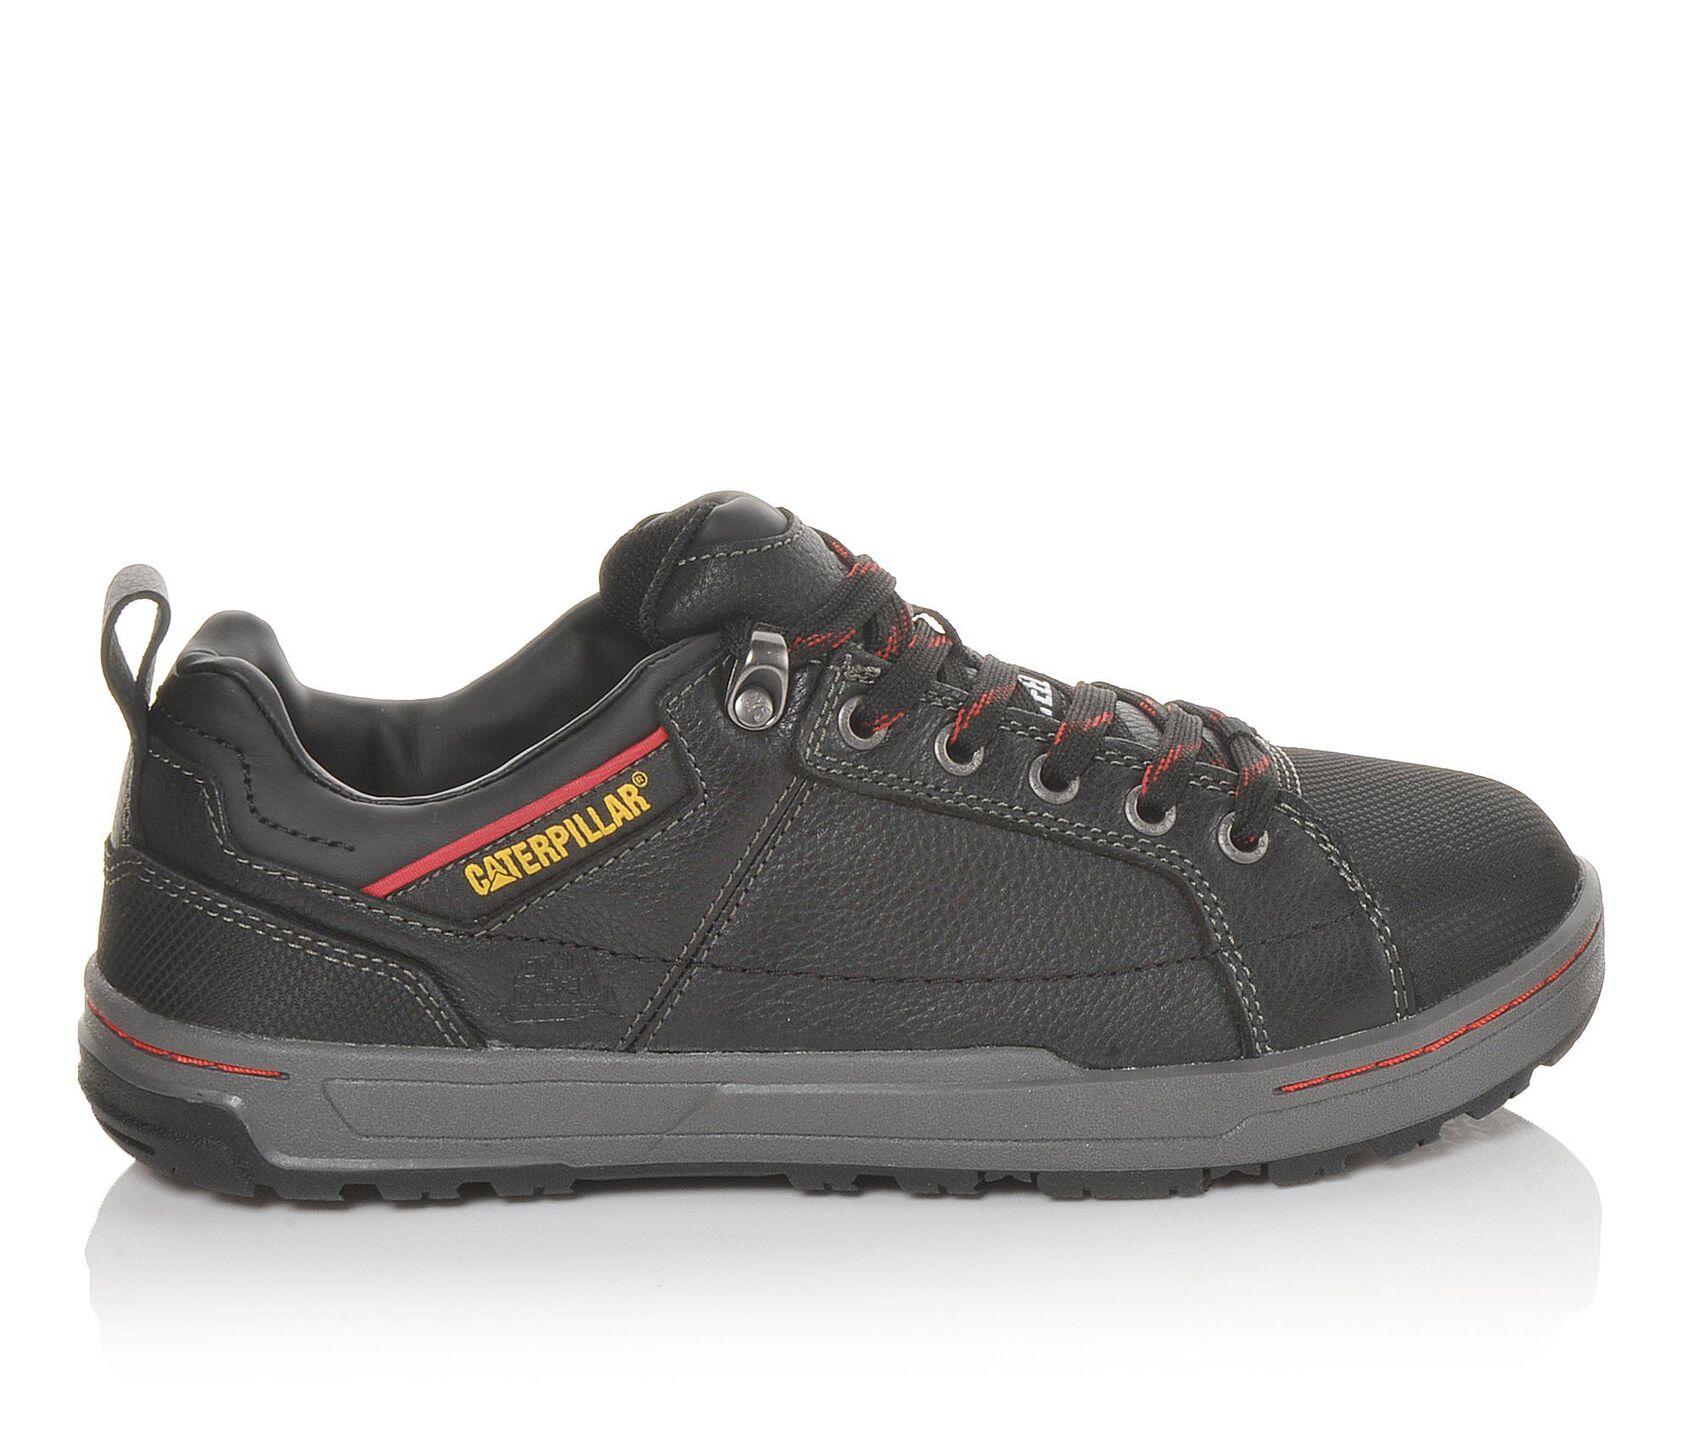 Menu0026#39;s Caterpillar Brode Steel Toe Oxford Work Shoes